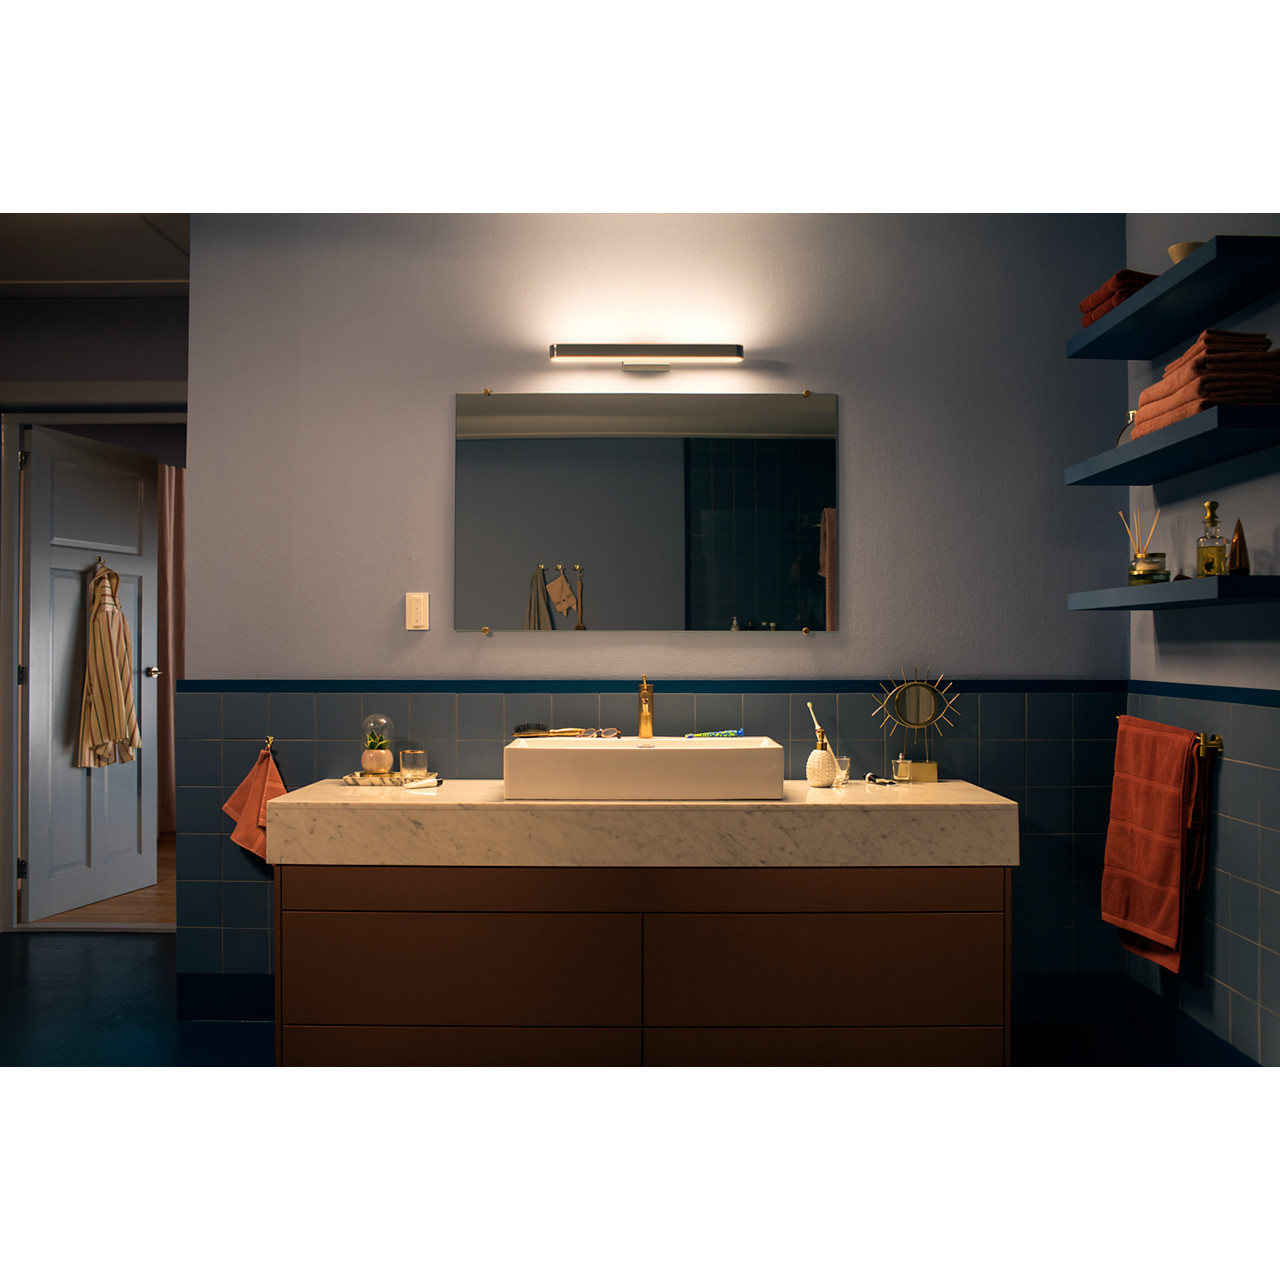 Hue White Ambience Adore Bathroom Mirror Light 3435111p7 Philips In 2019 Bathroom Mirror